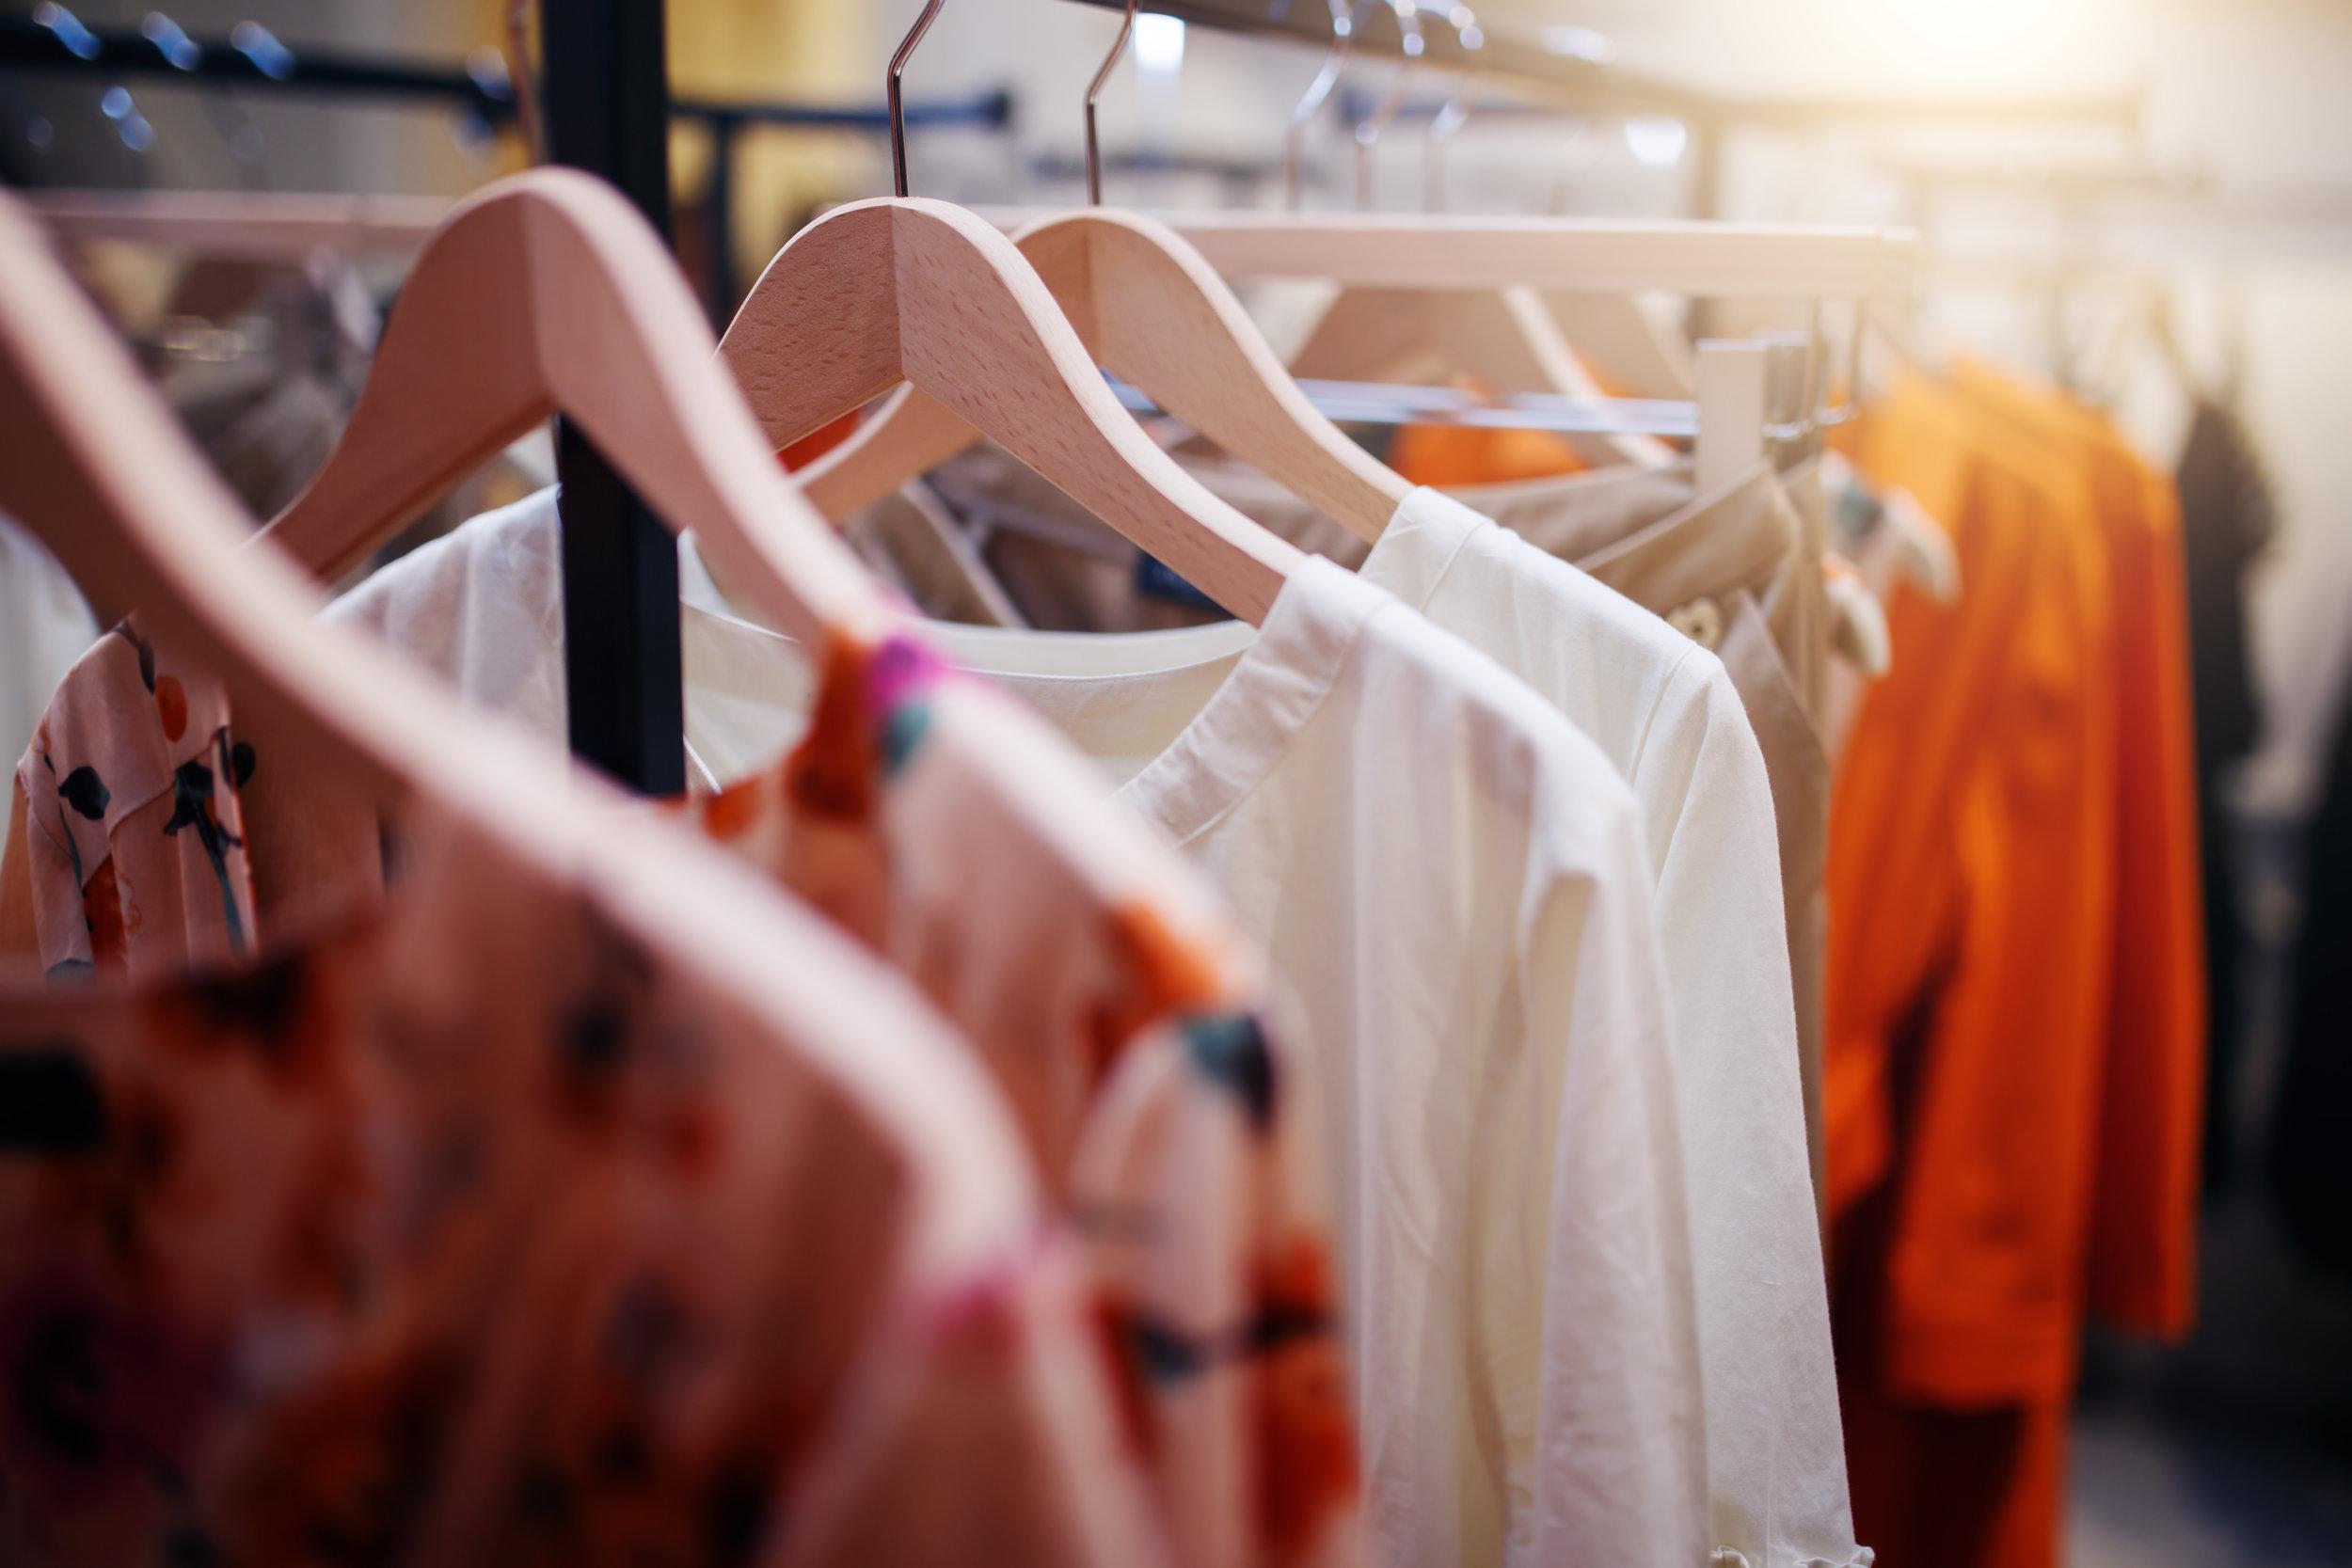 bigstock-Clothing-On-Hanger-At-The-Mode-131136365.jpg